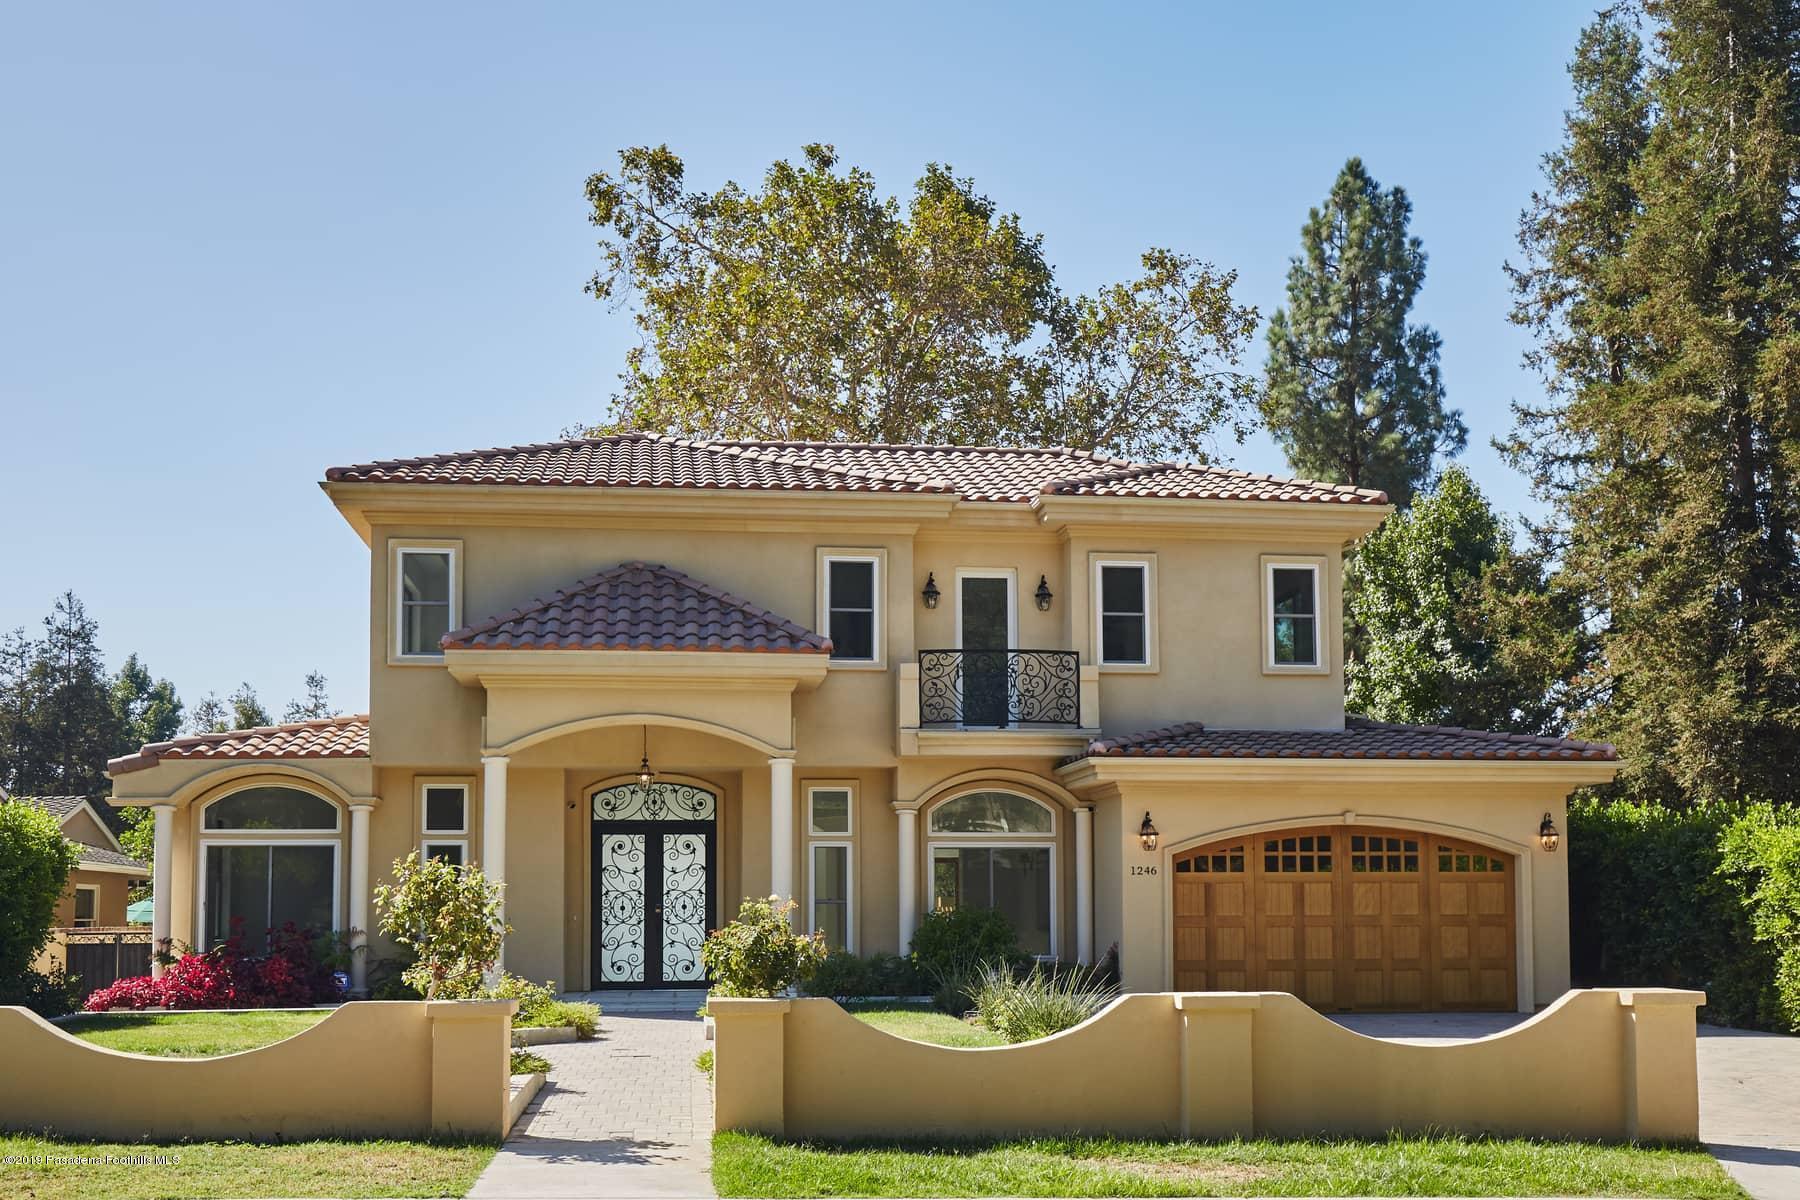 1246 El Vago Street, La Canada Flintridge, CA 91011